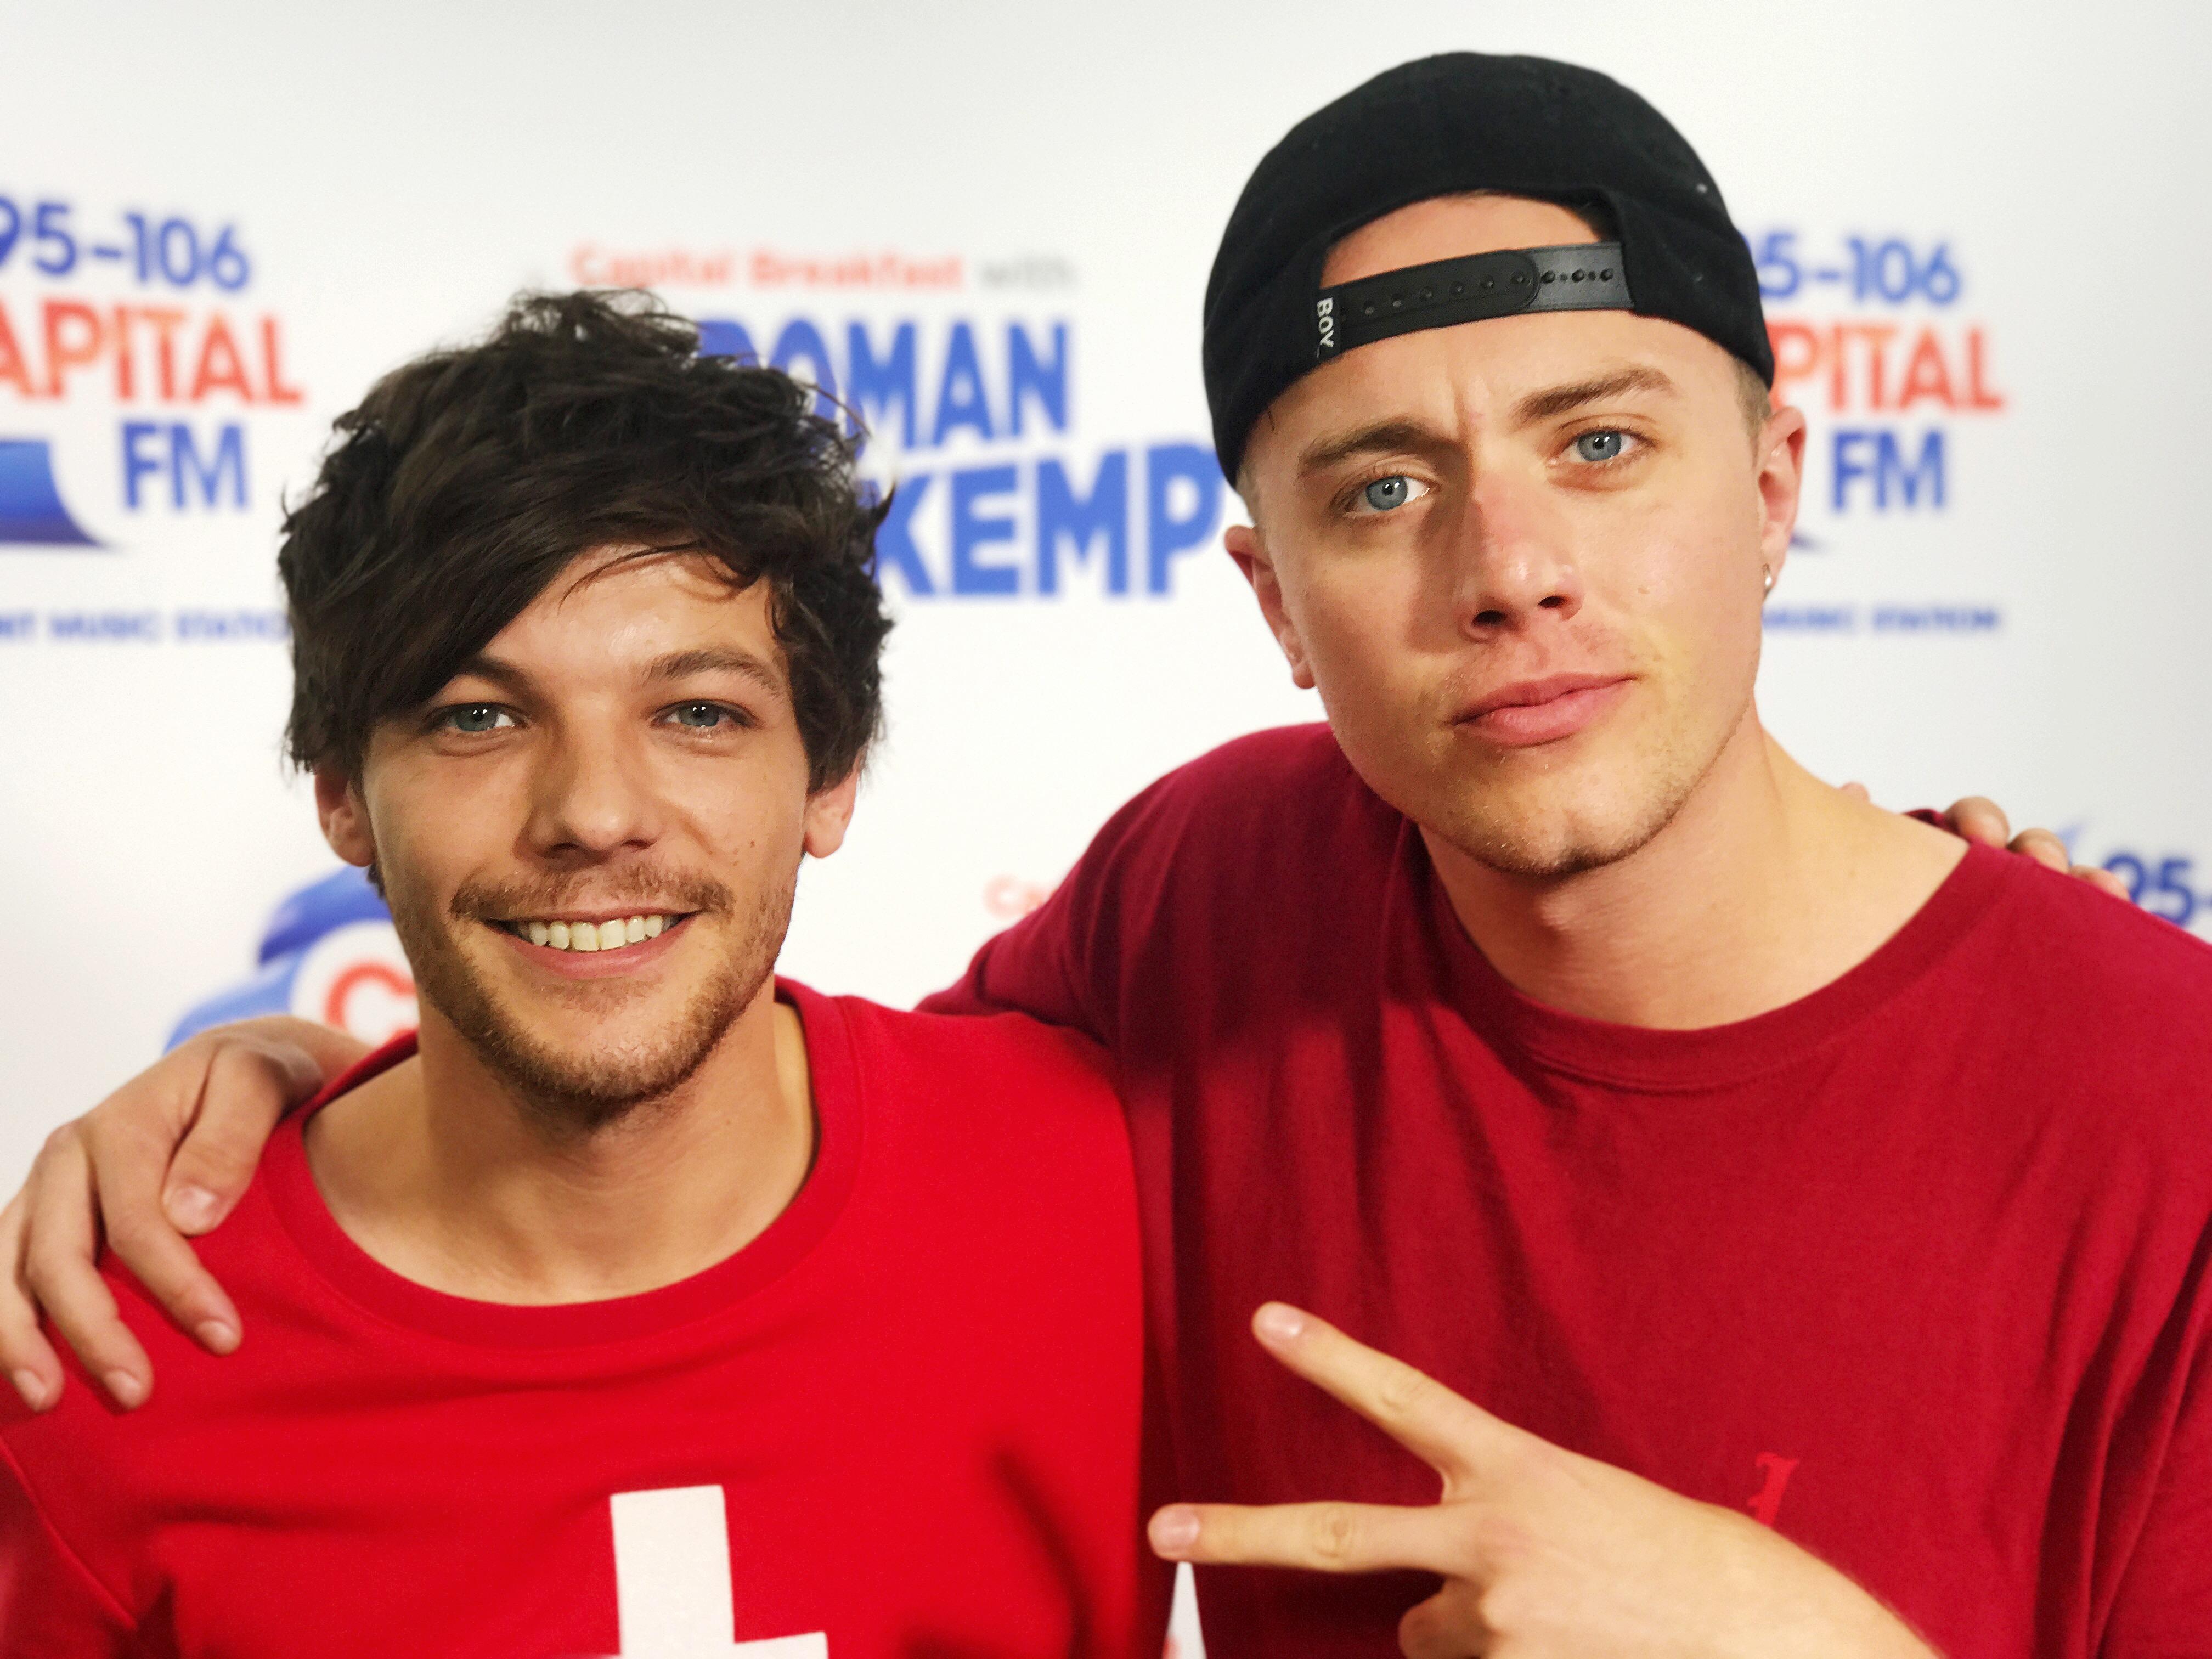 Louis Tomlinson With Roman Kemp